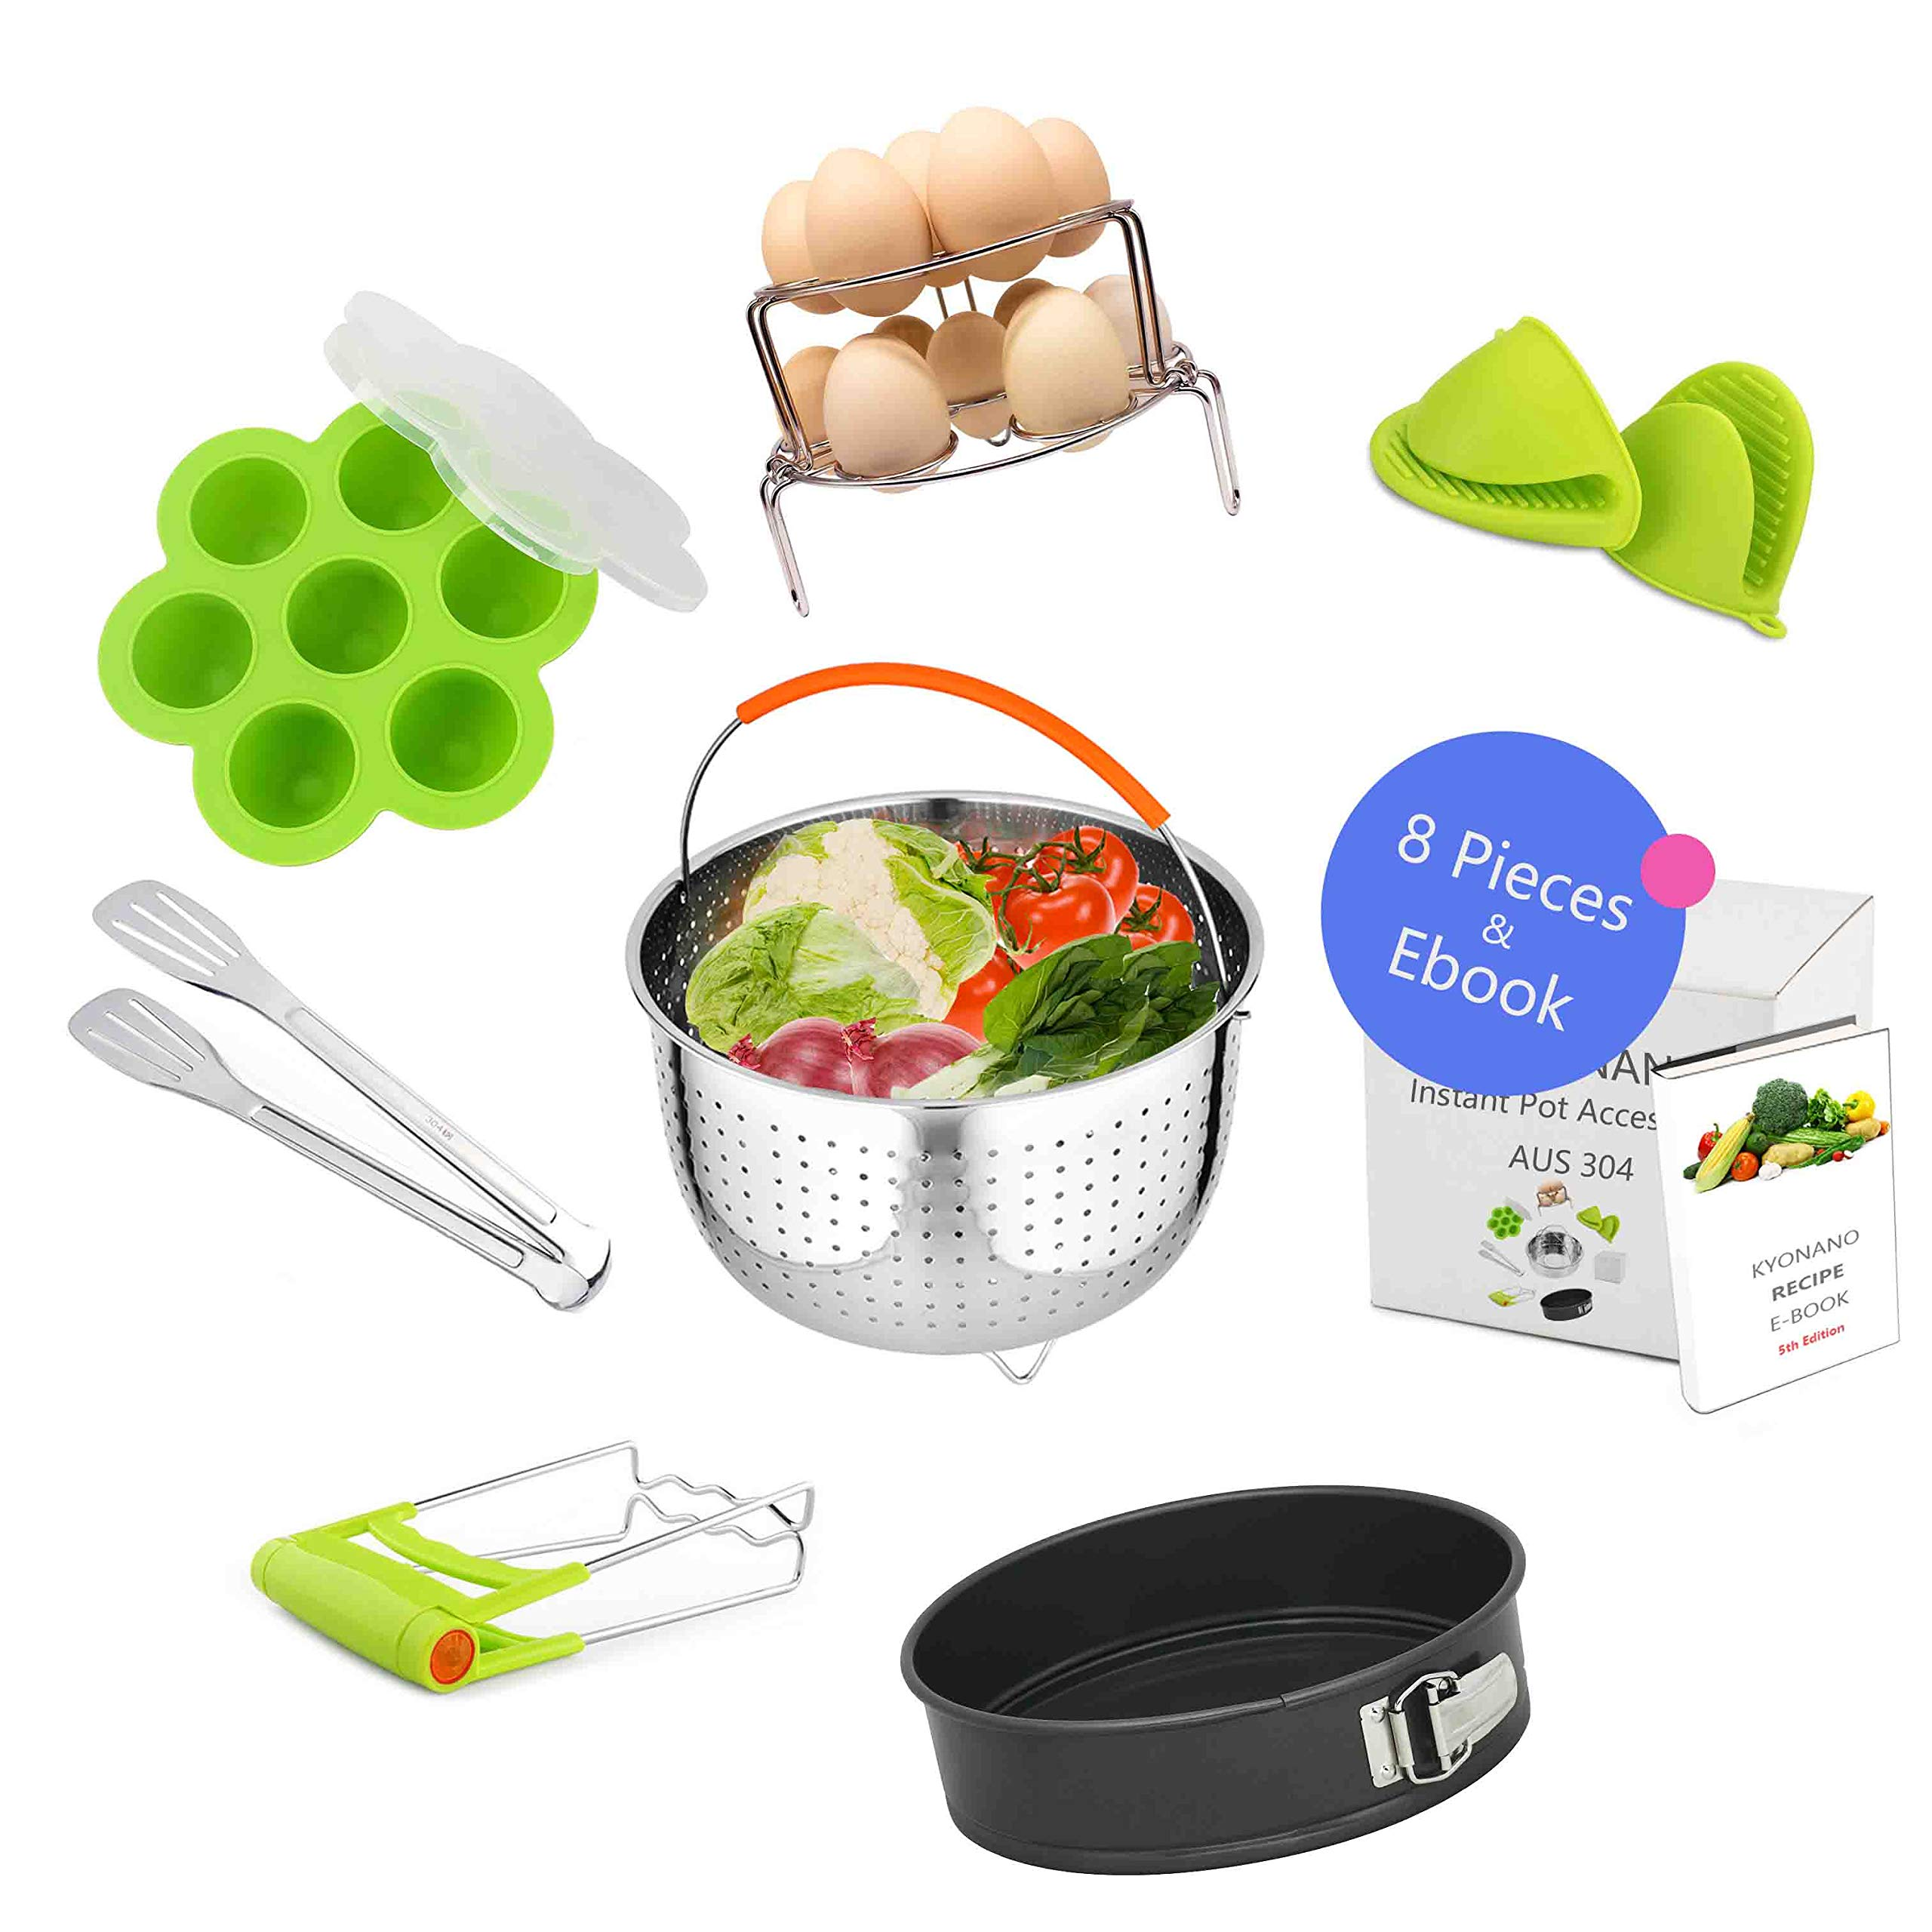 Instant Pot Accessories Set 8 Pcs Compatible with Instant Pot 5 6 8QT Include Steamer Basket, Springform Pan, Egg Steamer Rack Set, Egg Bites Mold, Tong, Plate Gripper, Silicone Gloves